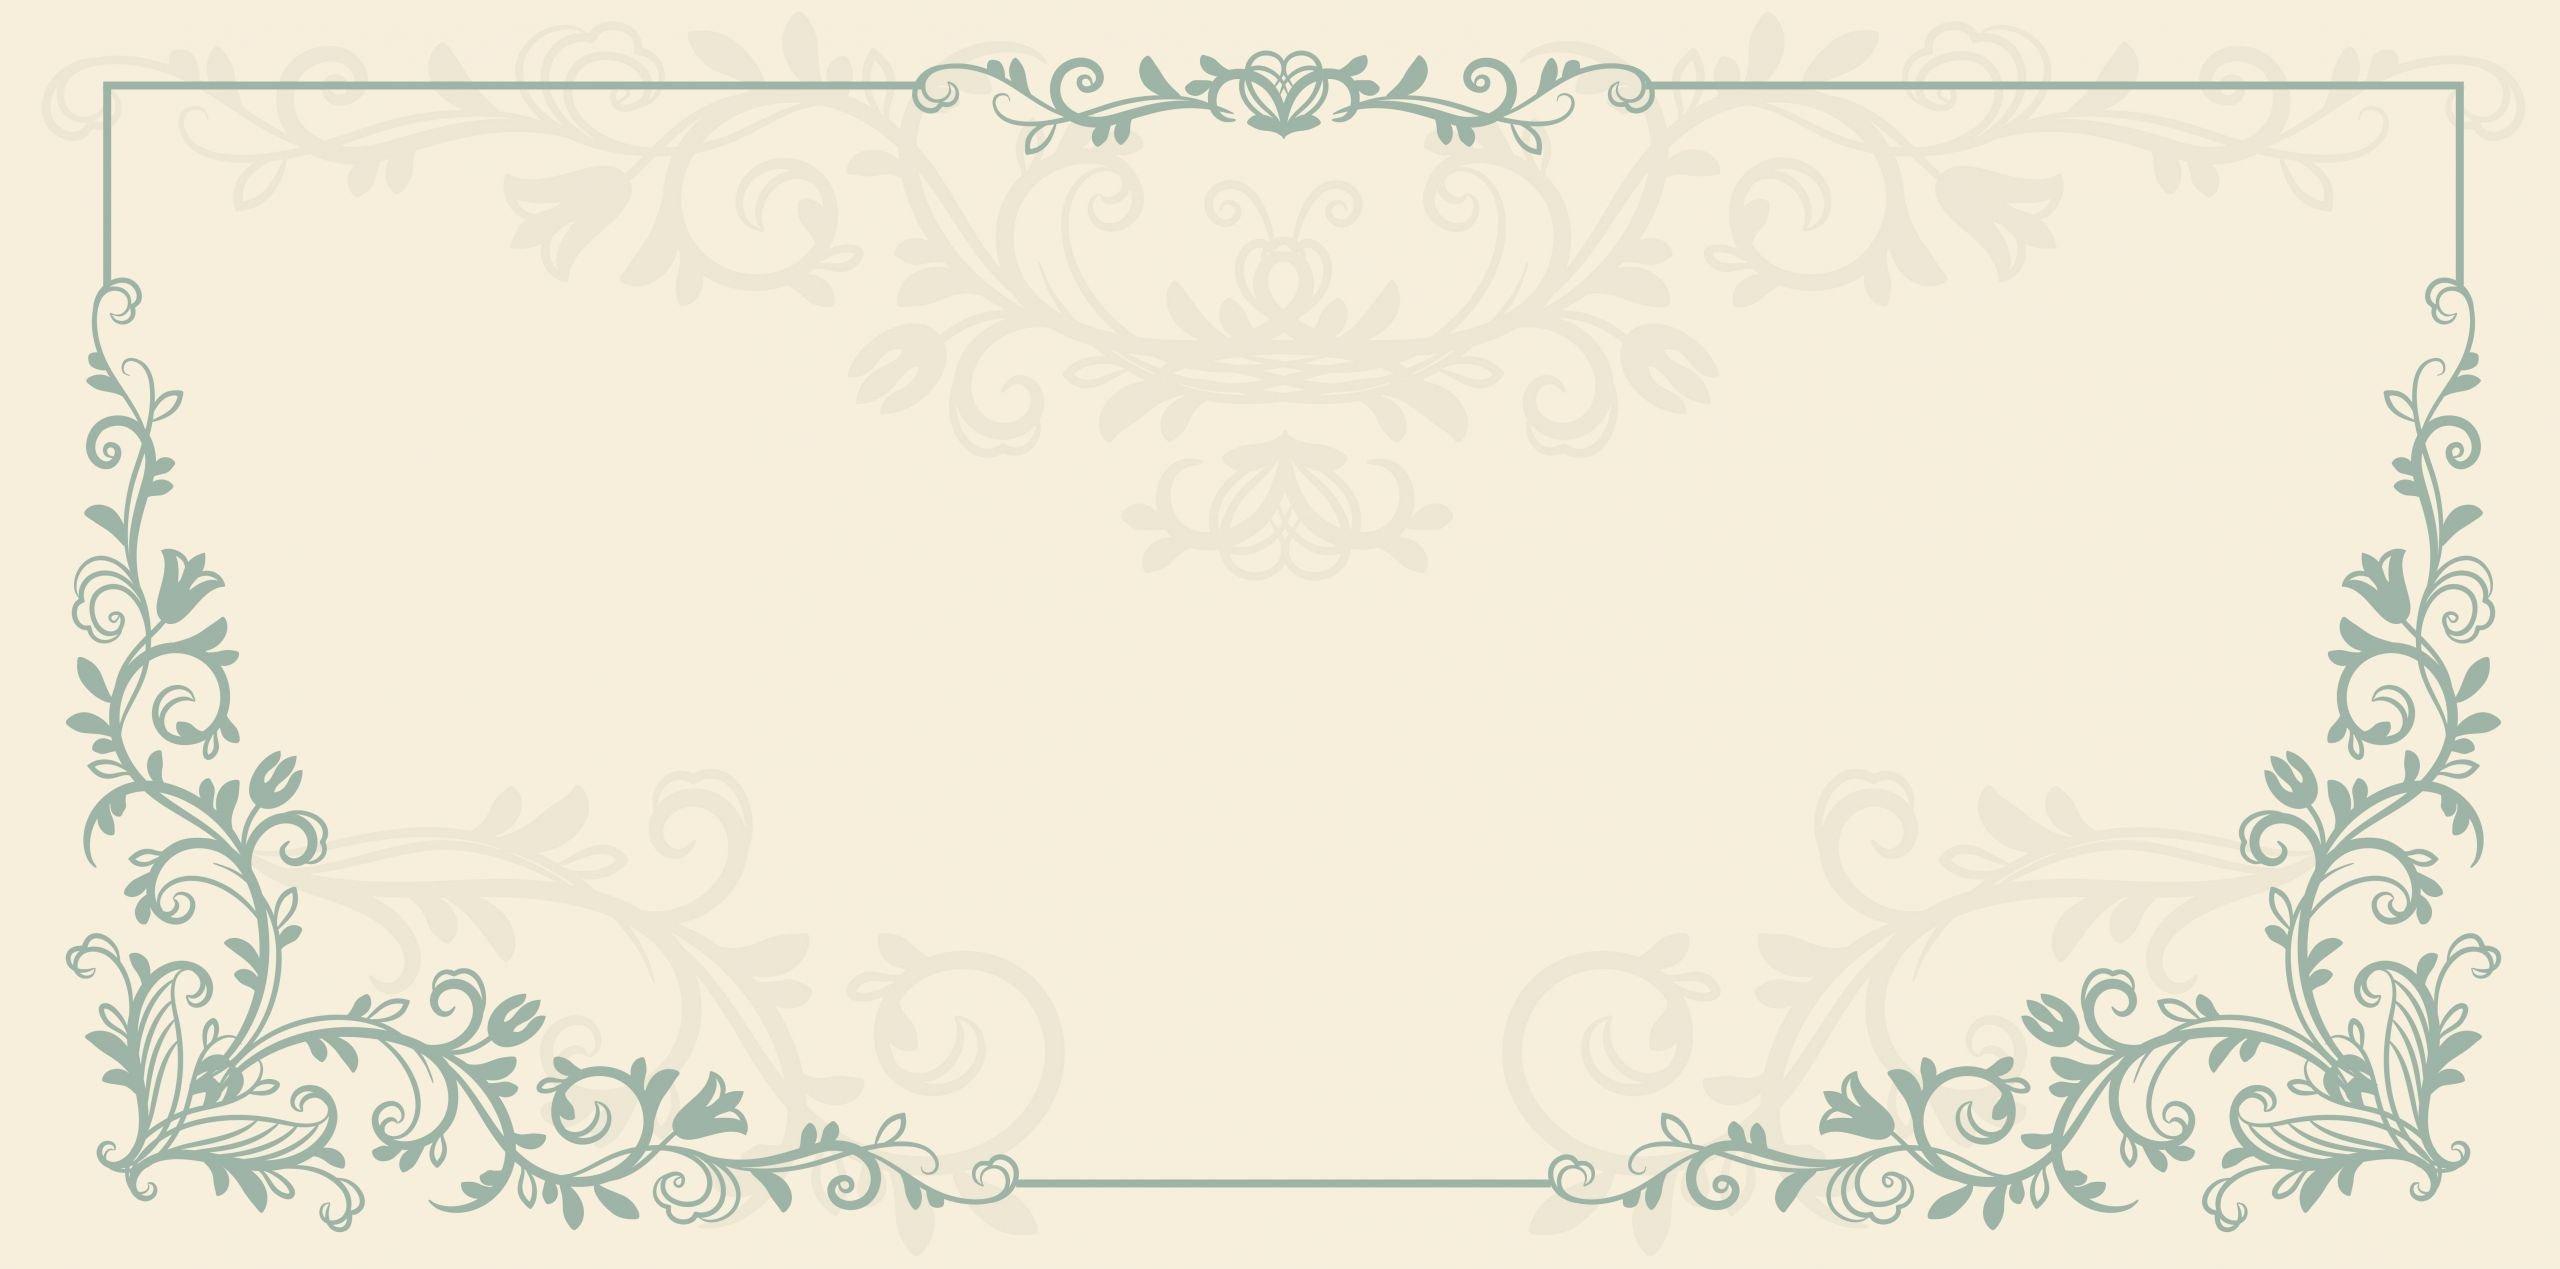 Purple Heart Certificate Template New Invitation Card Background S Invitation Card